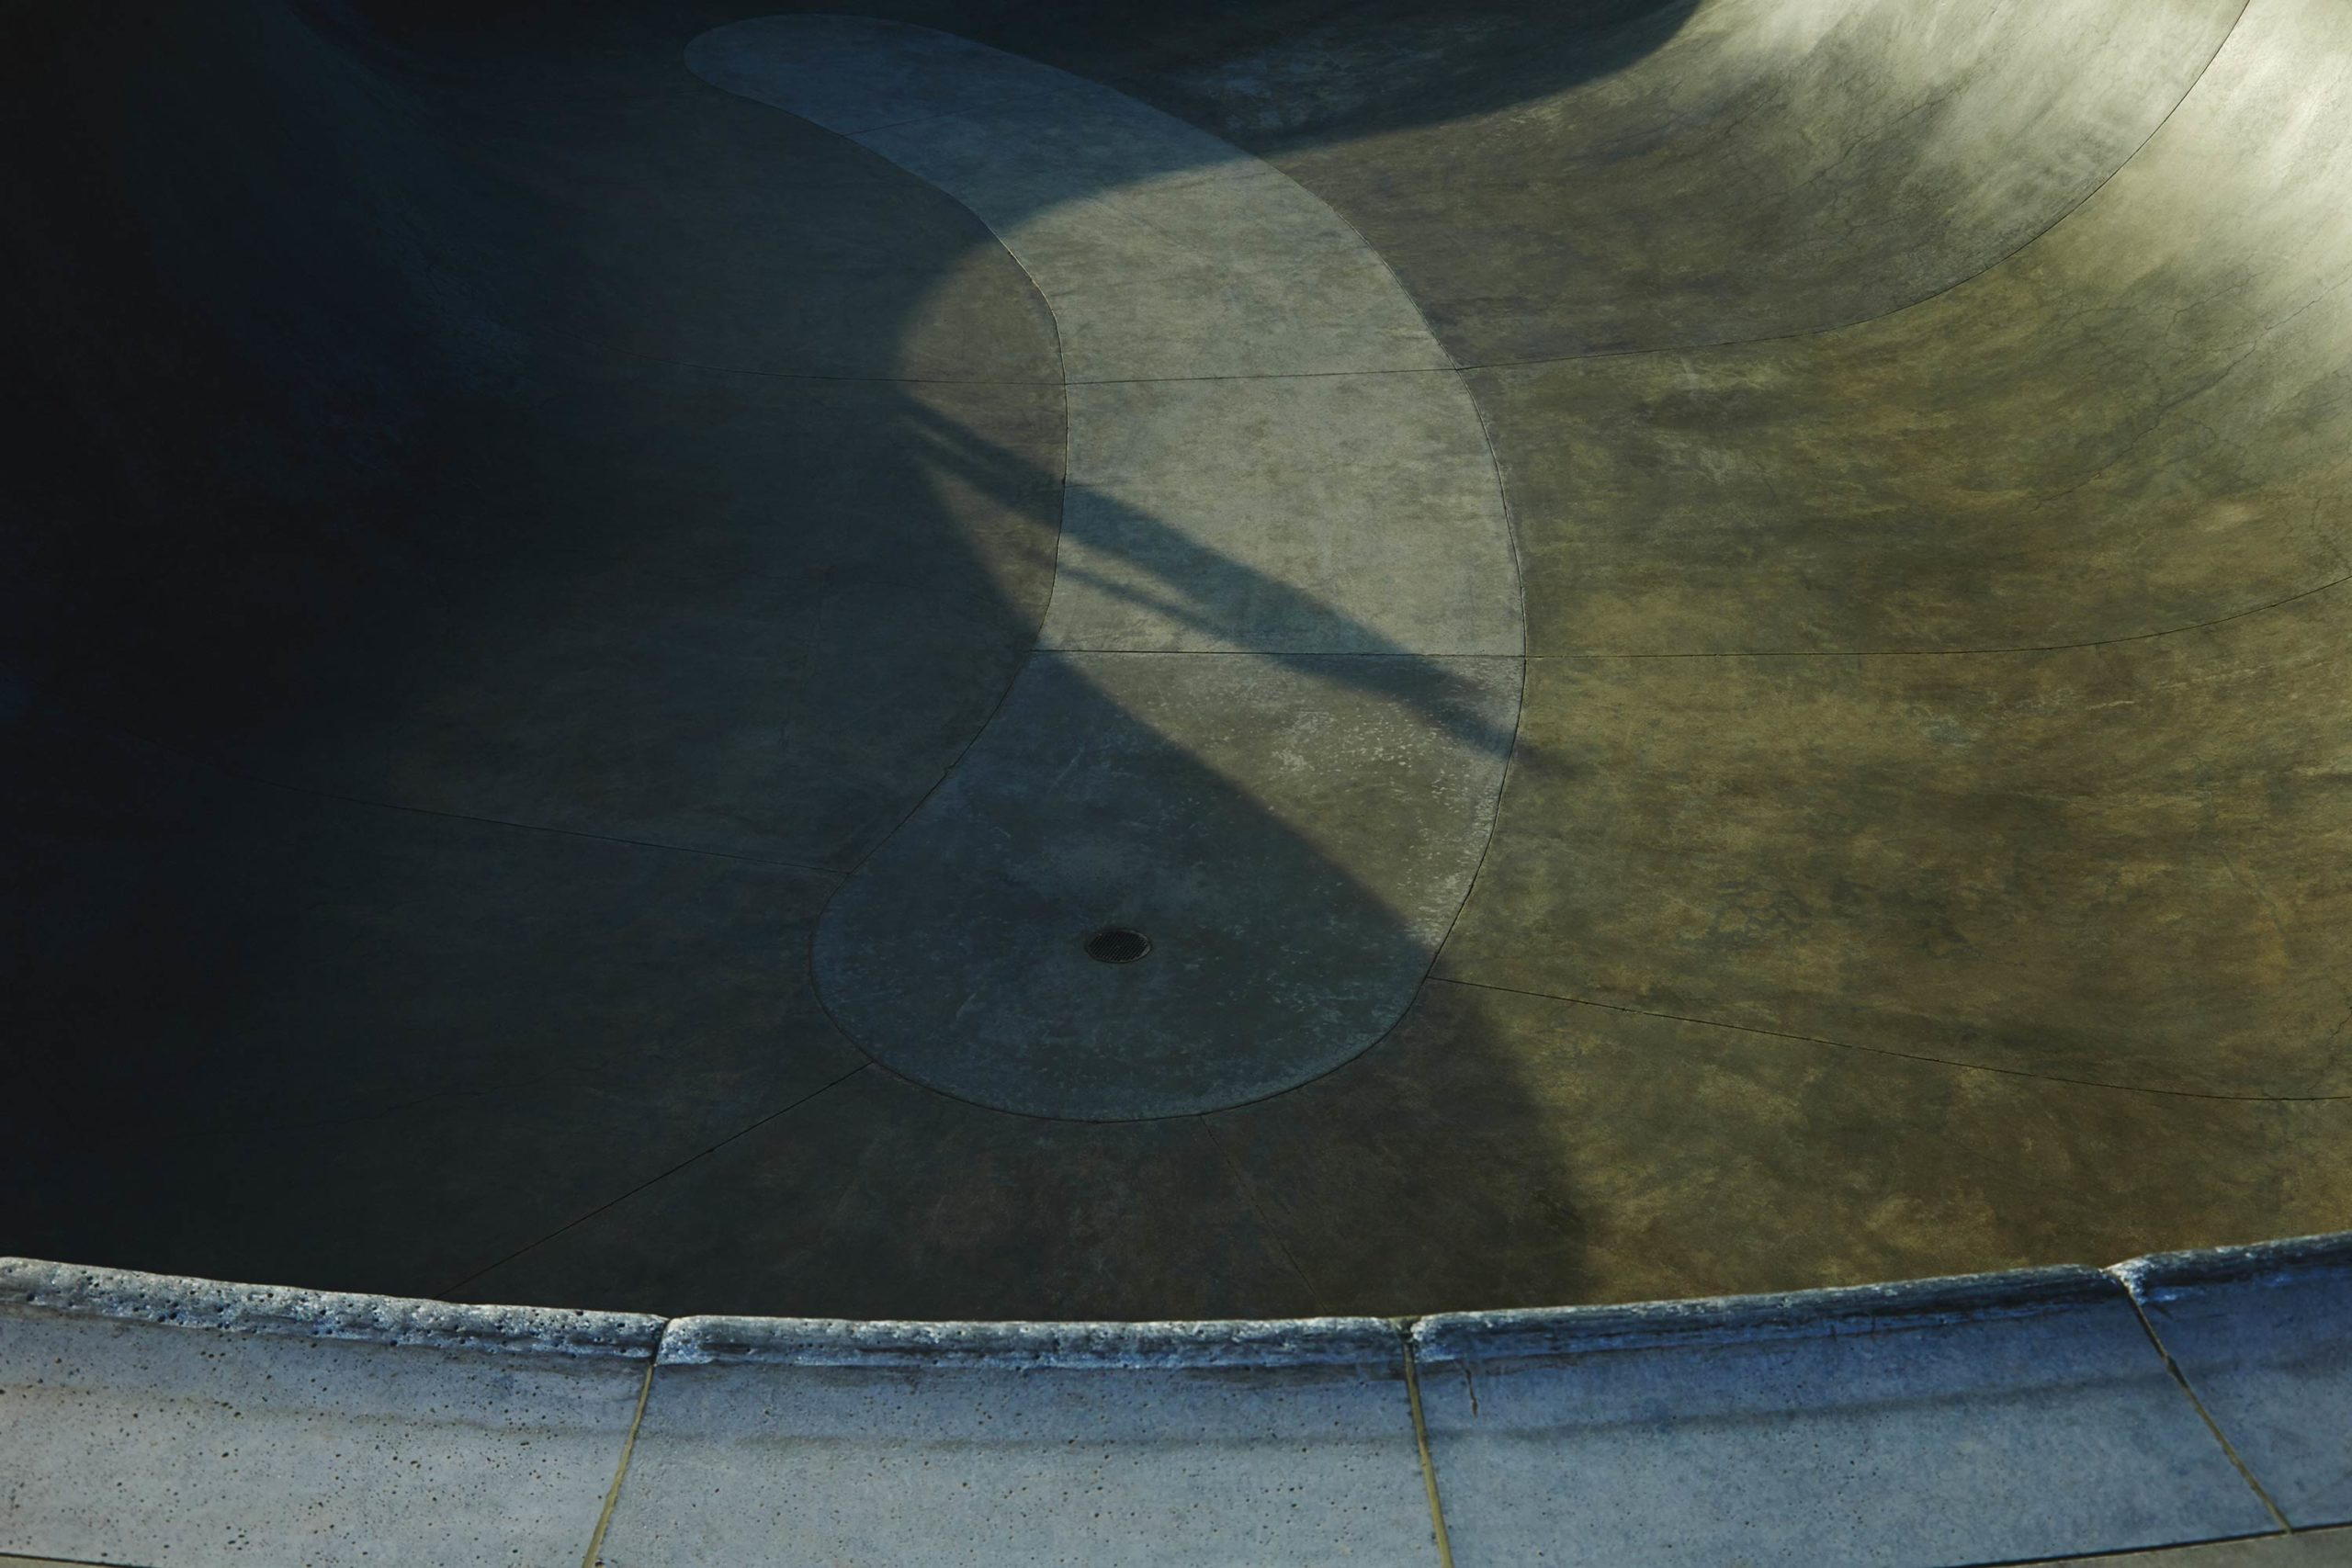 Purple Haze - Skate Park, Venice Beach Collection - Fine Art Photography by Toby Dixon